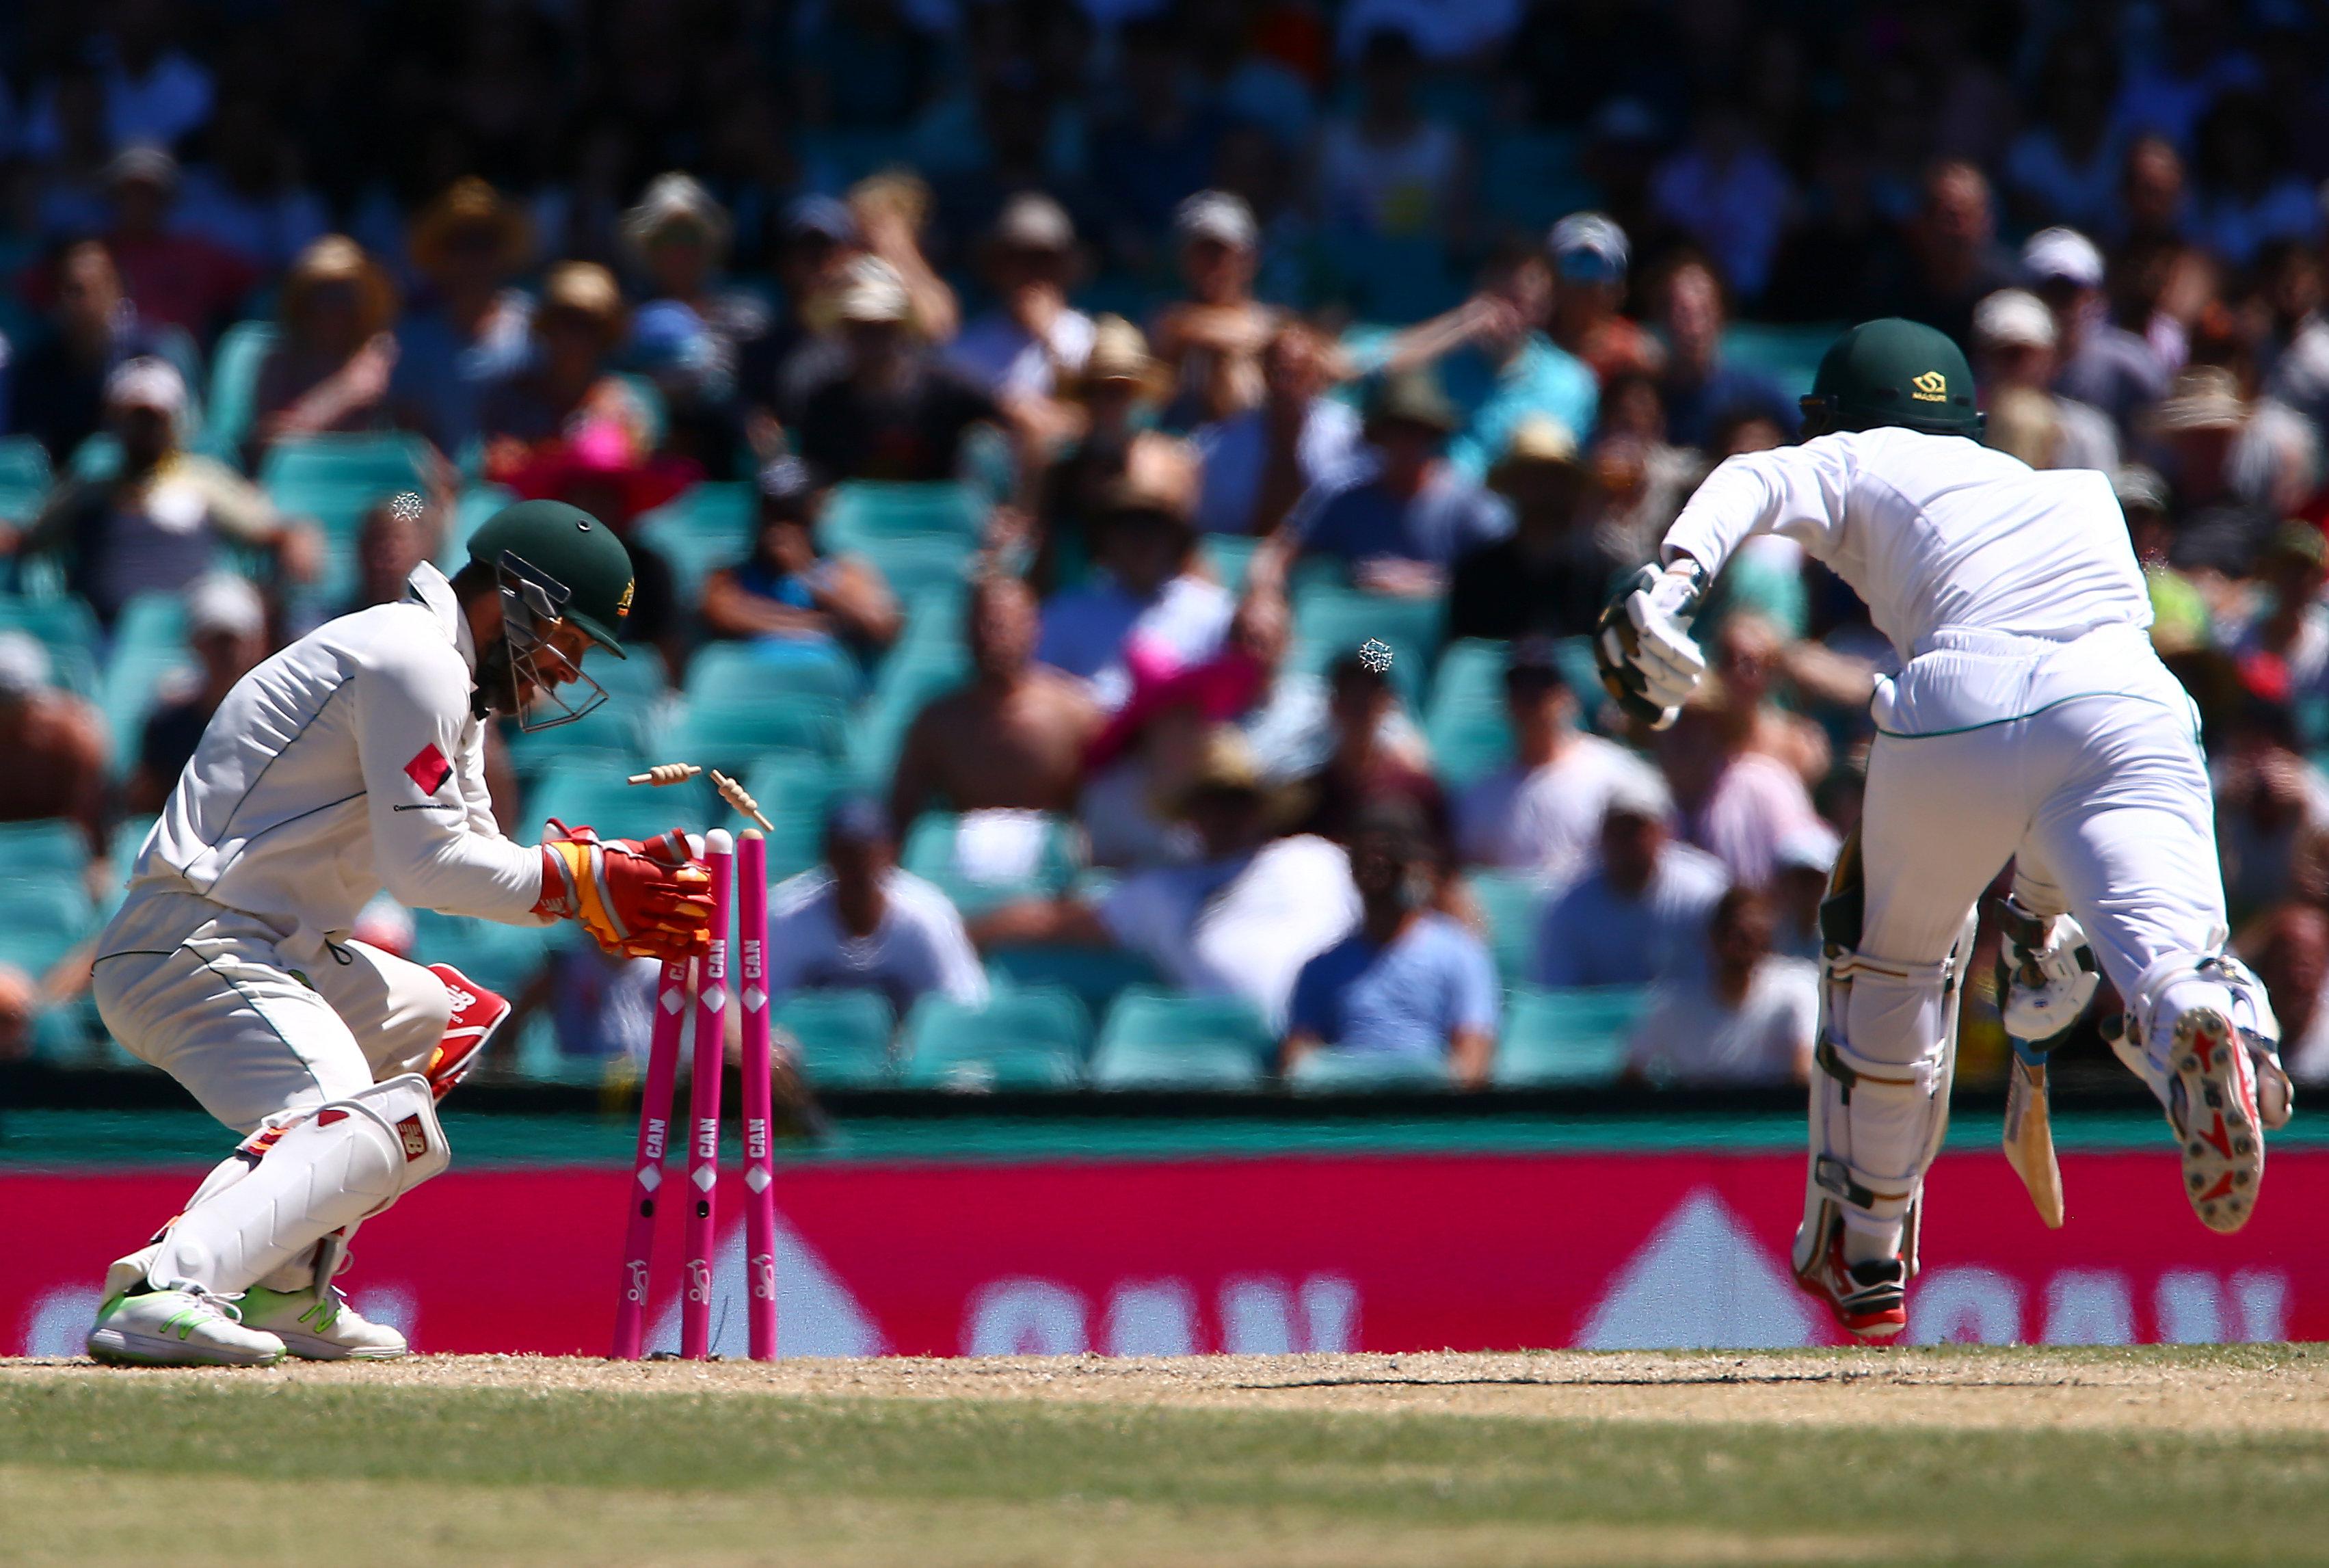 Cricket - Australia v Pakistan - Third Test cricket match - Sydney Cricket Ground, Sydney, Australia - 7/1/17 Australia's wicketkeeper Matthew Wade runs out Pakistan's Mohammad Amir.